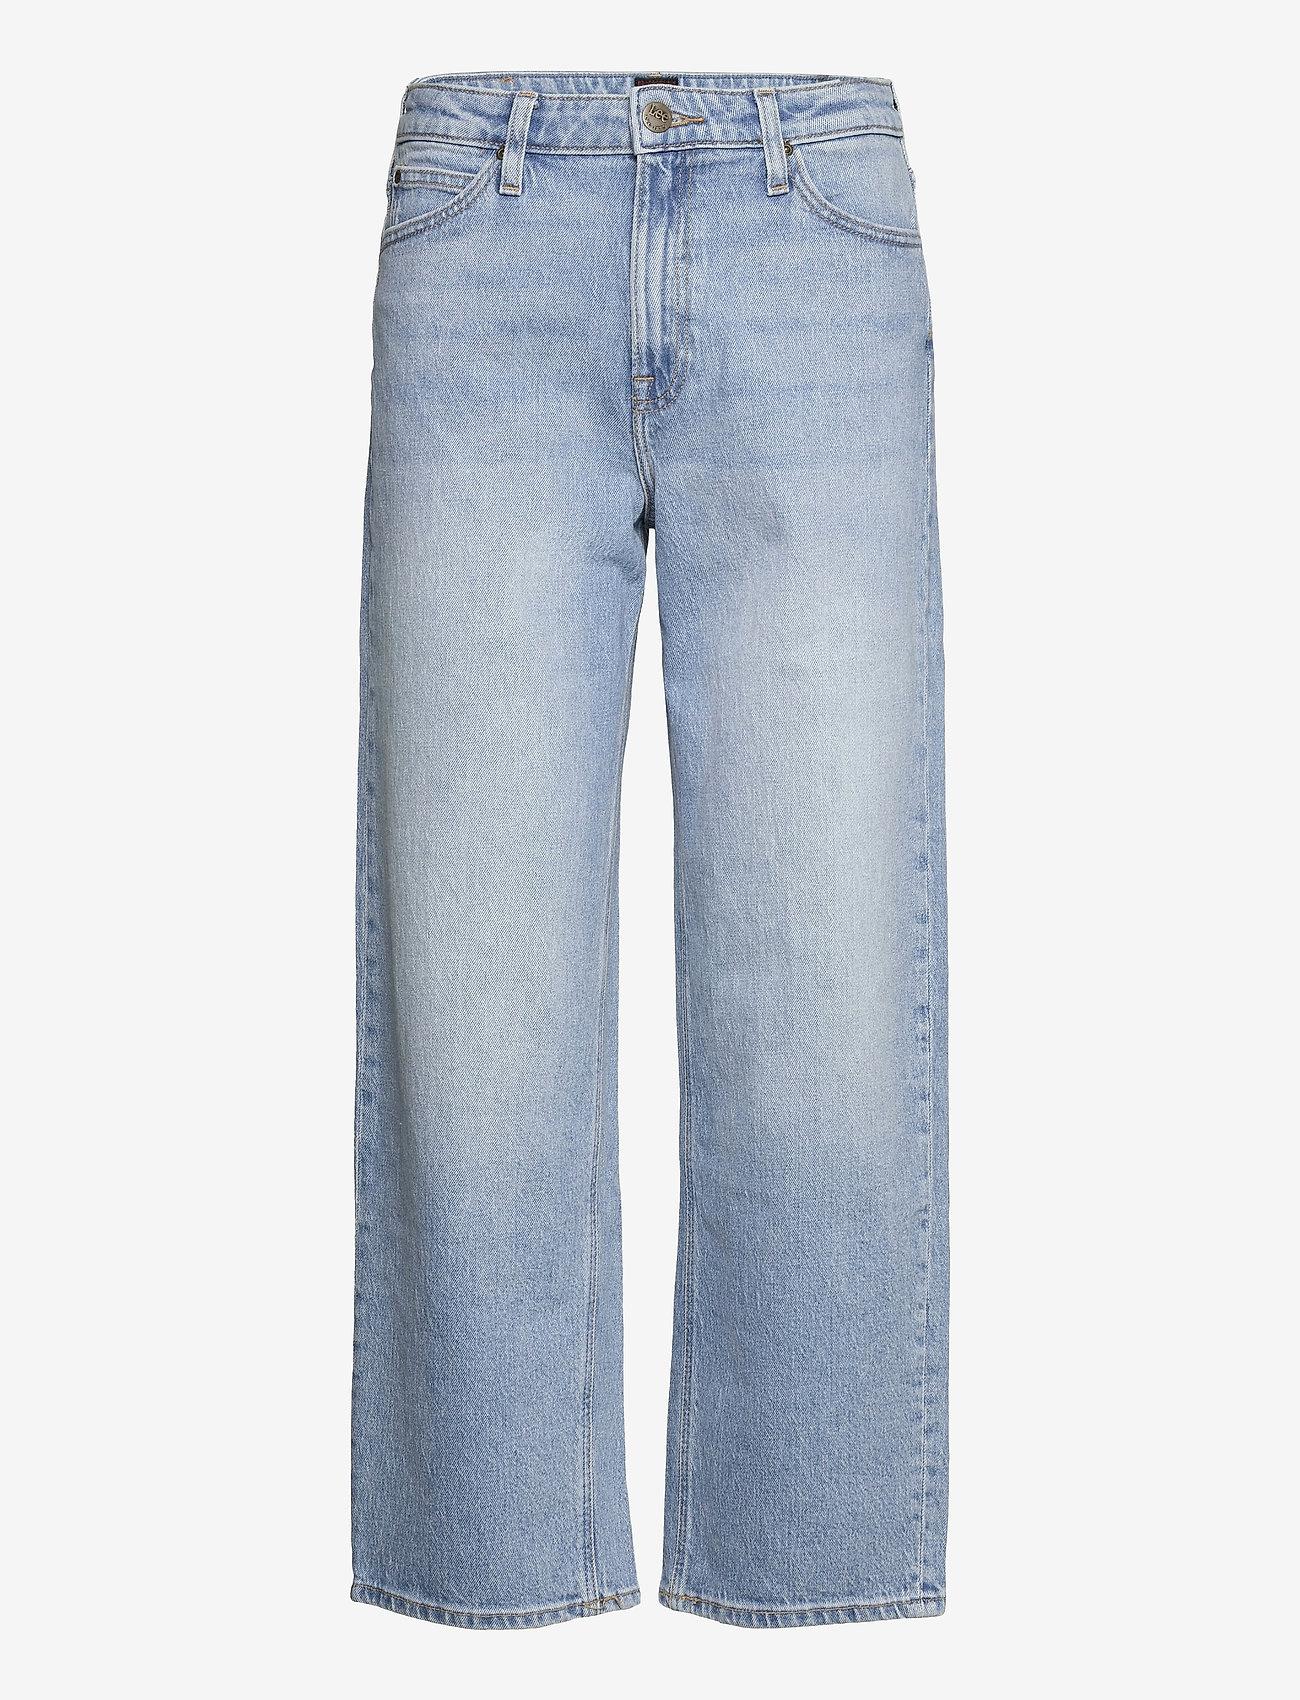 Lee Jeans - WIDE LEG - brede jeans - mid soho - 0